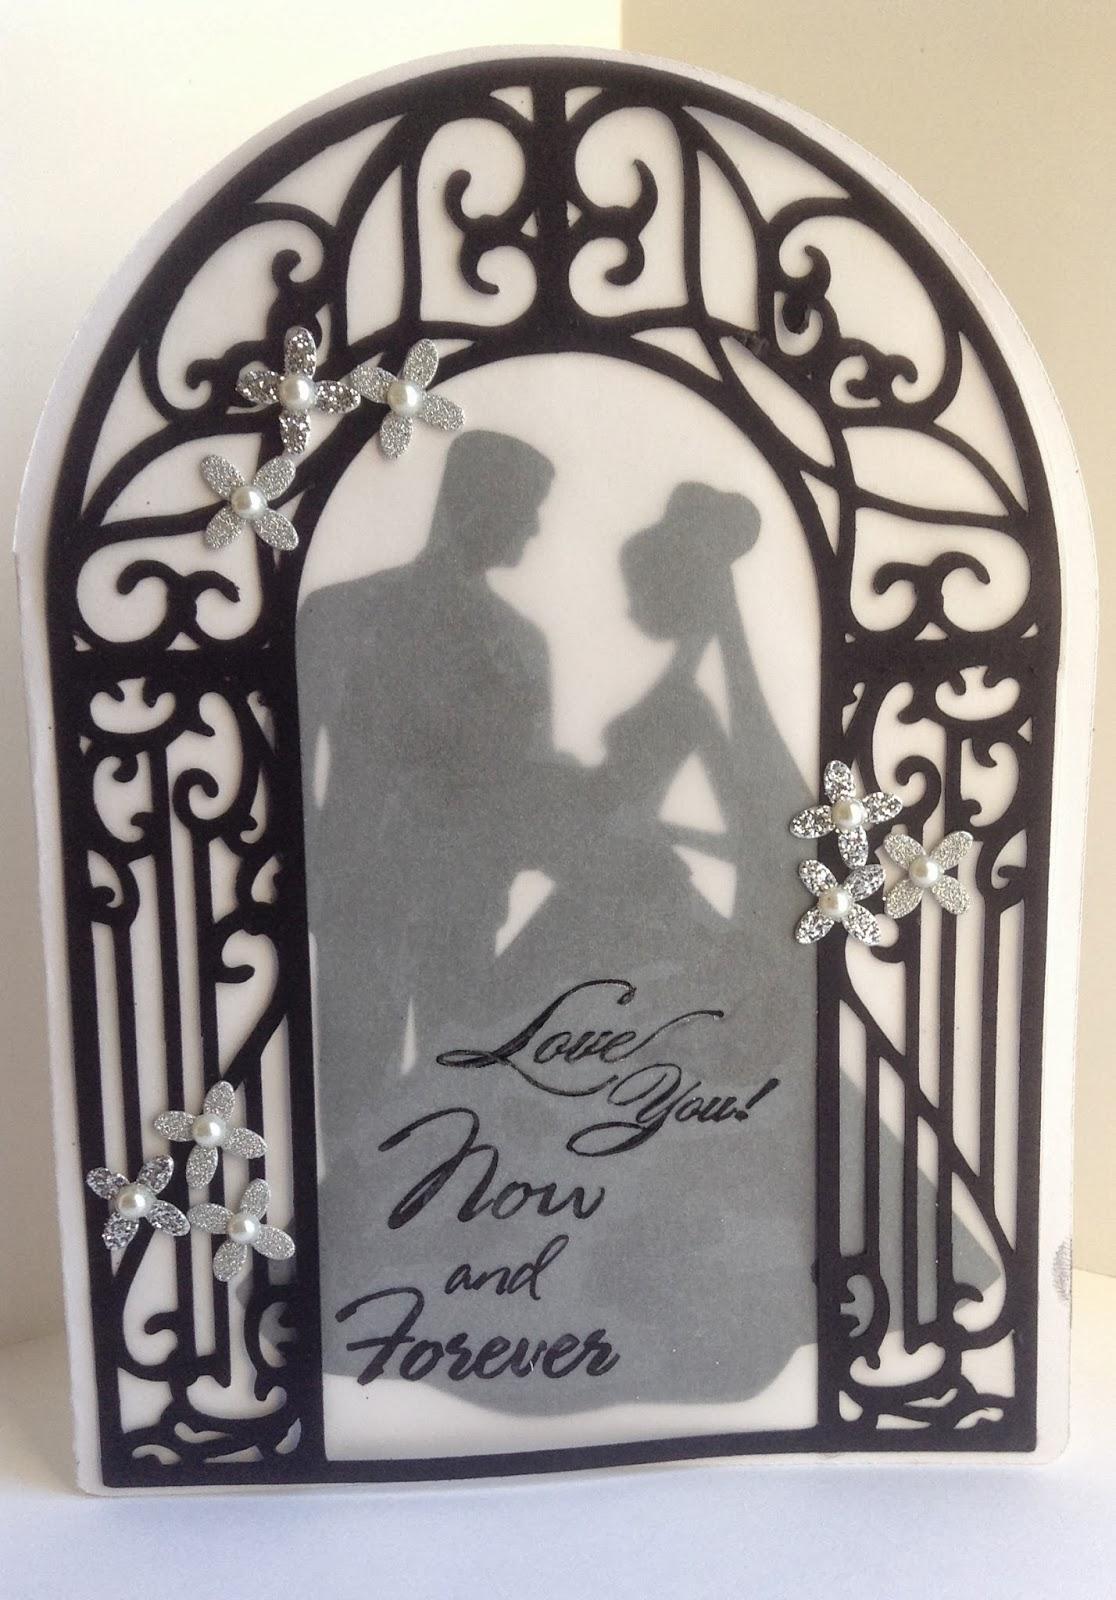 21 Wedding Anniversary Gift: Cricutcraftyclare: 21st Wedding Anniversary